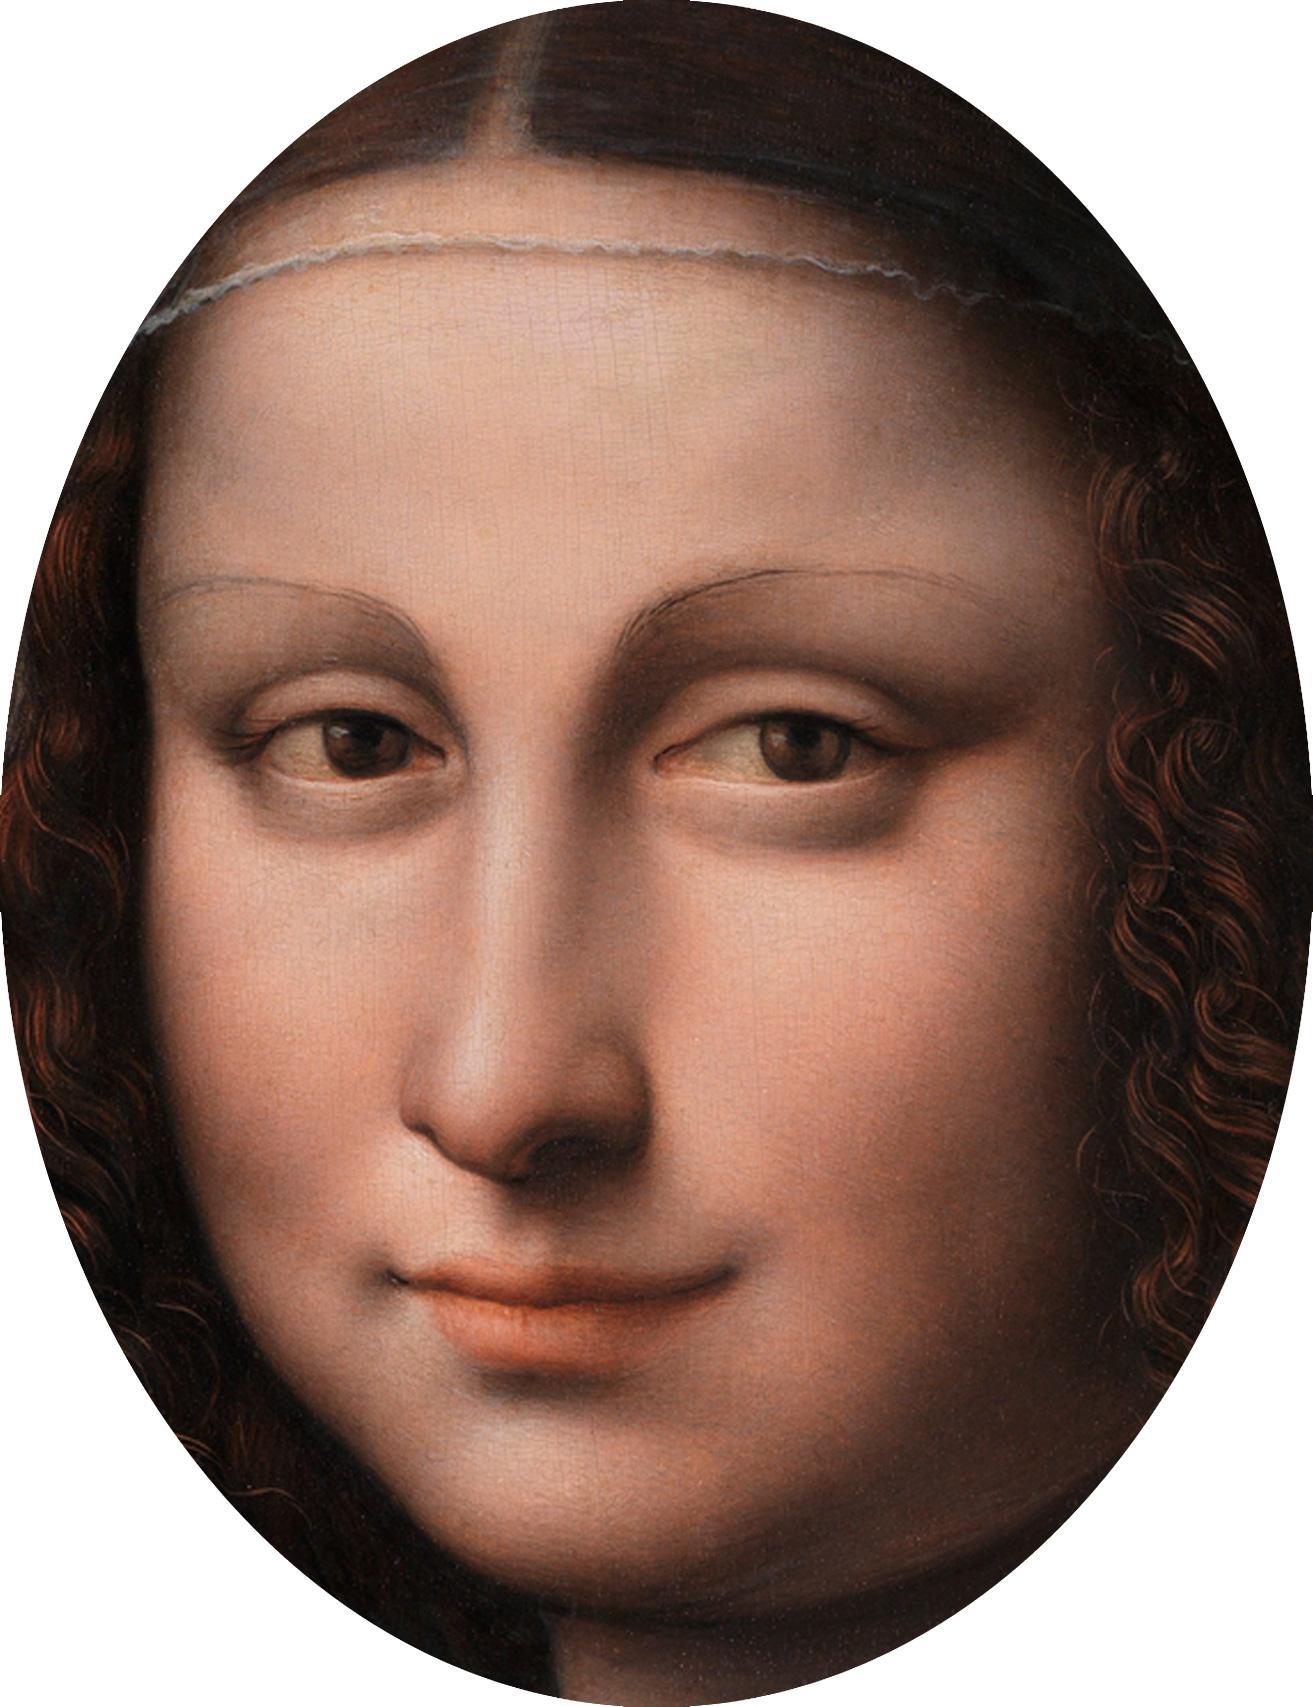 monalisa-prado-face.jpg